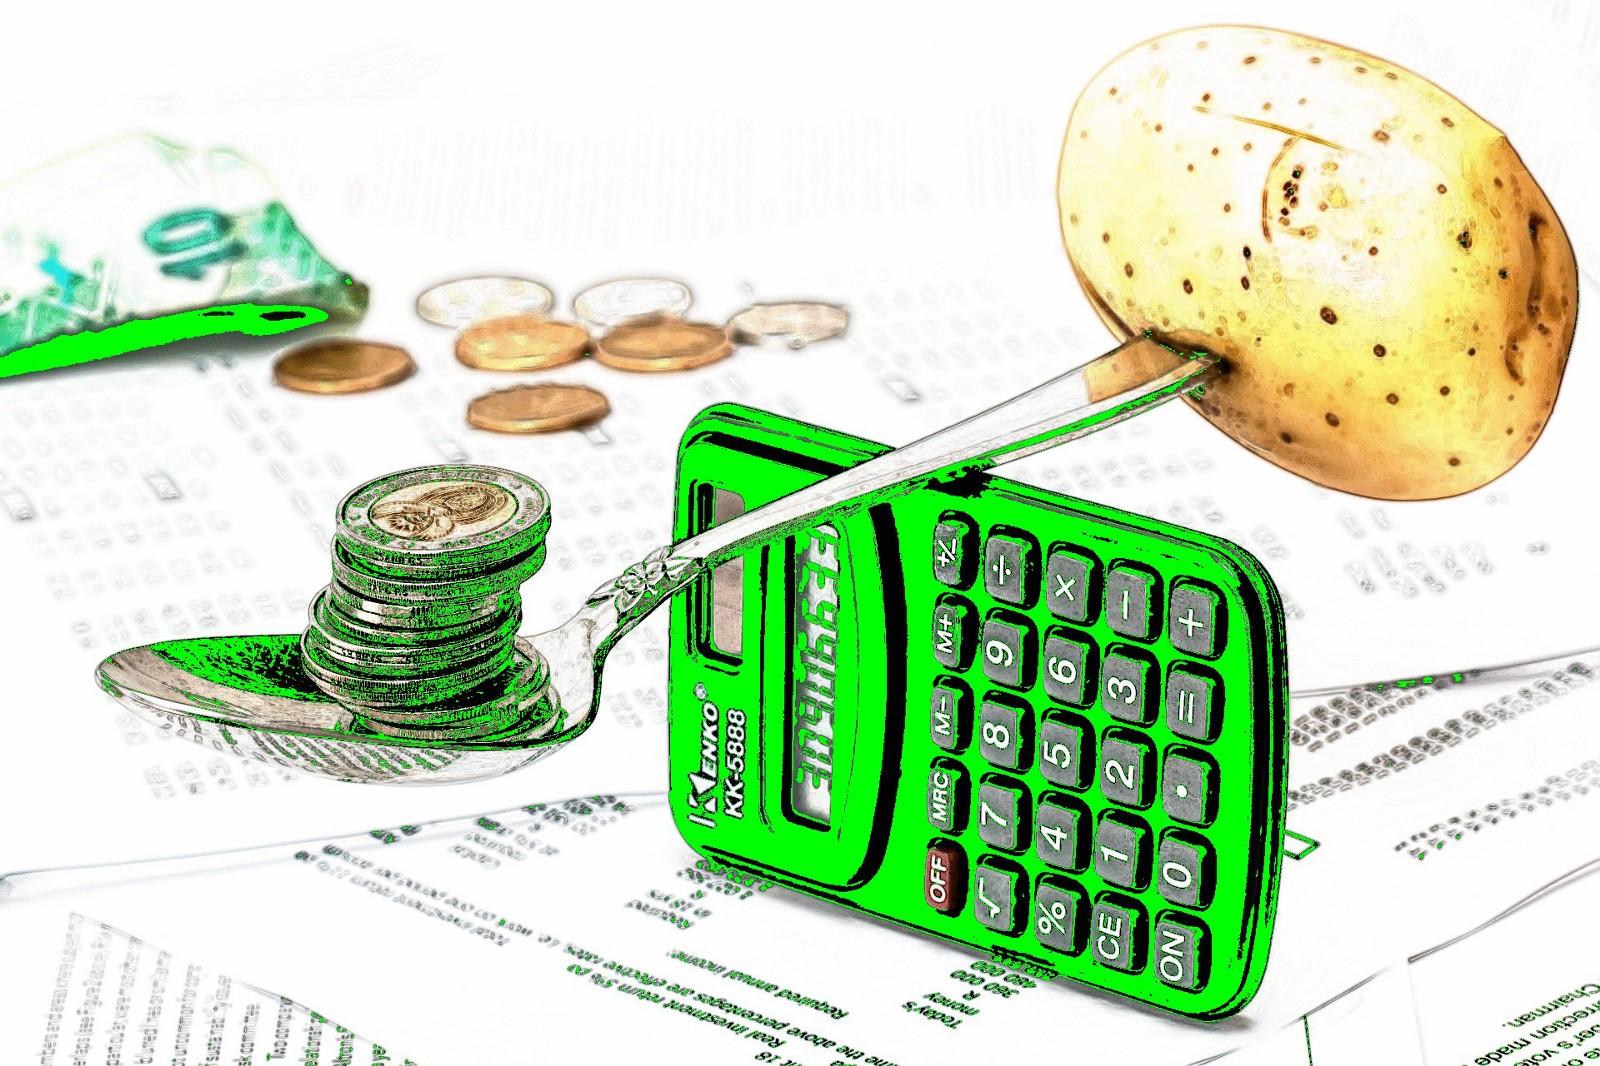 /work-life-balance-tech-vs-finance-vs-consulting-f2dfdfe82de8 feature image